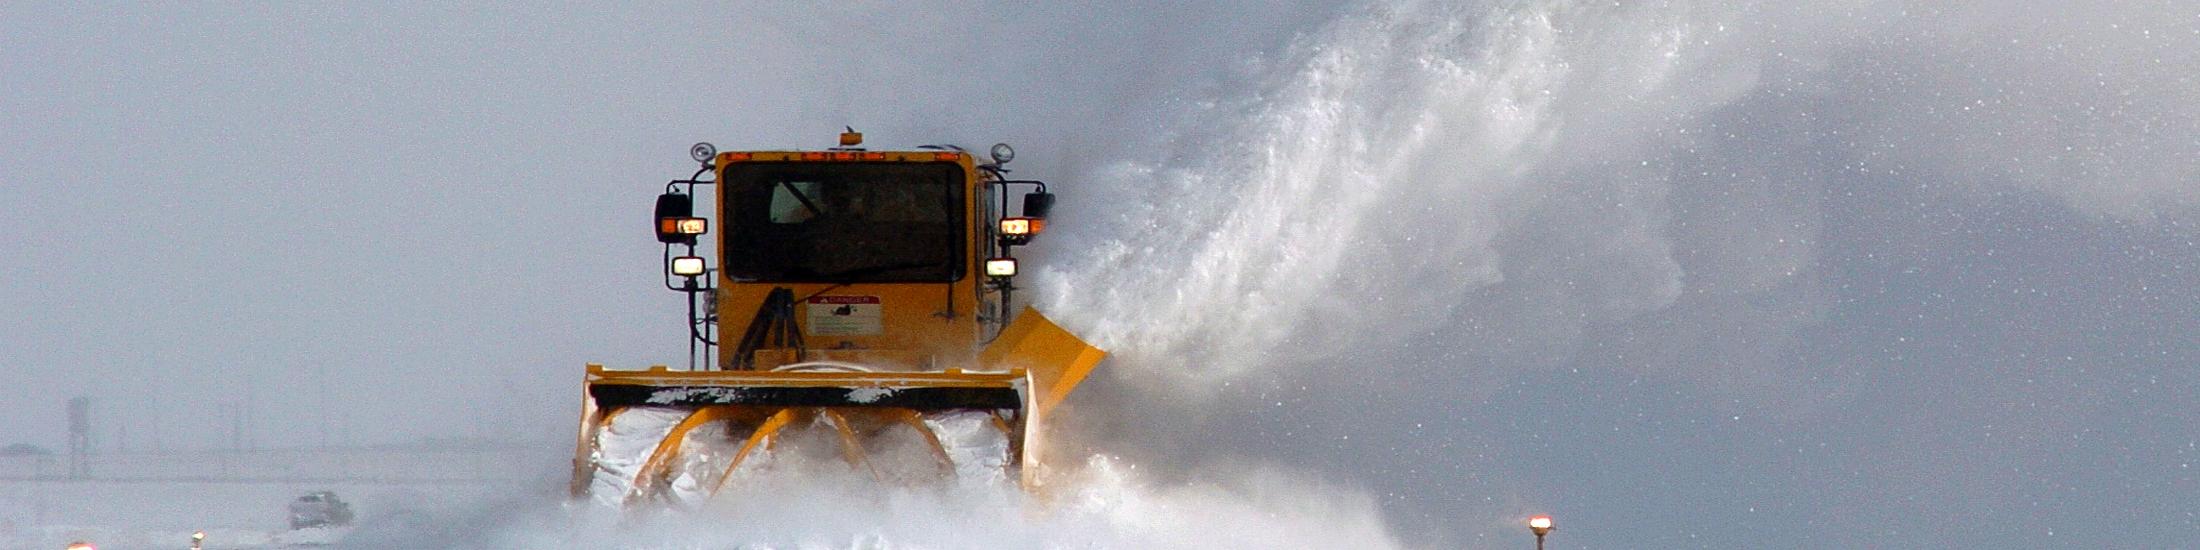 snowplowing-salting wisconsin dells wi